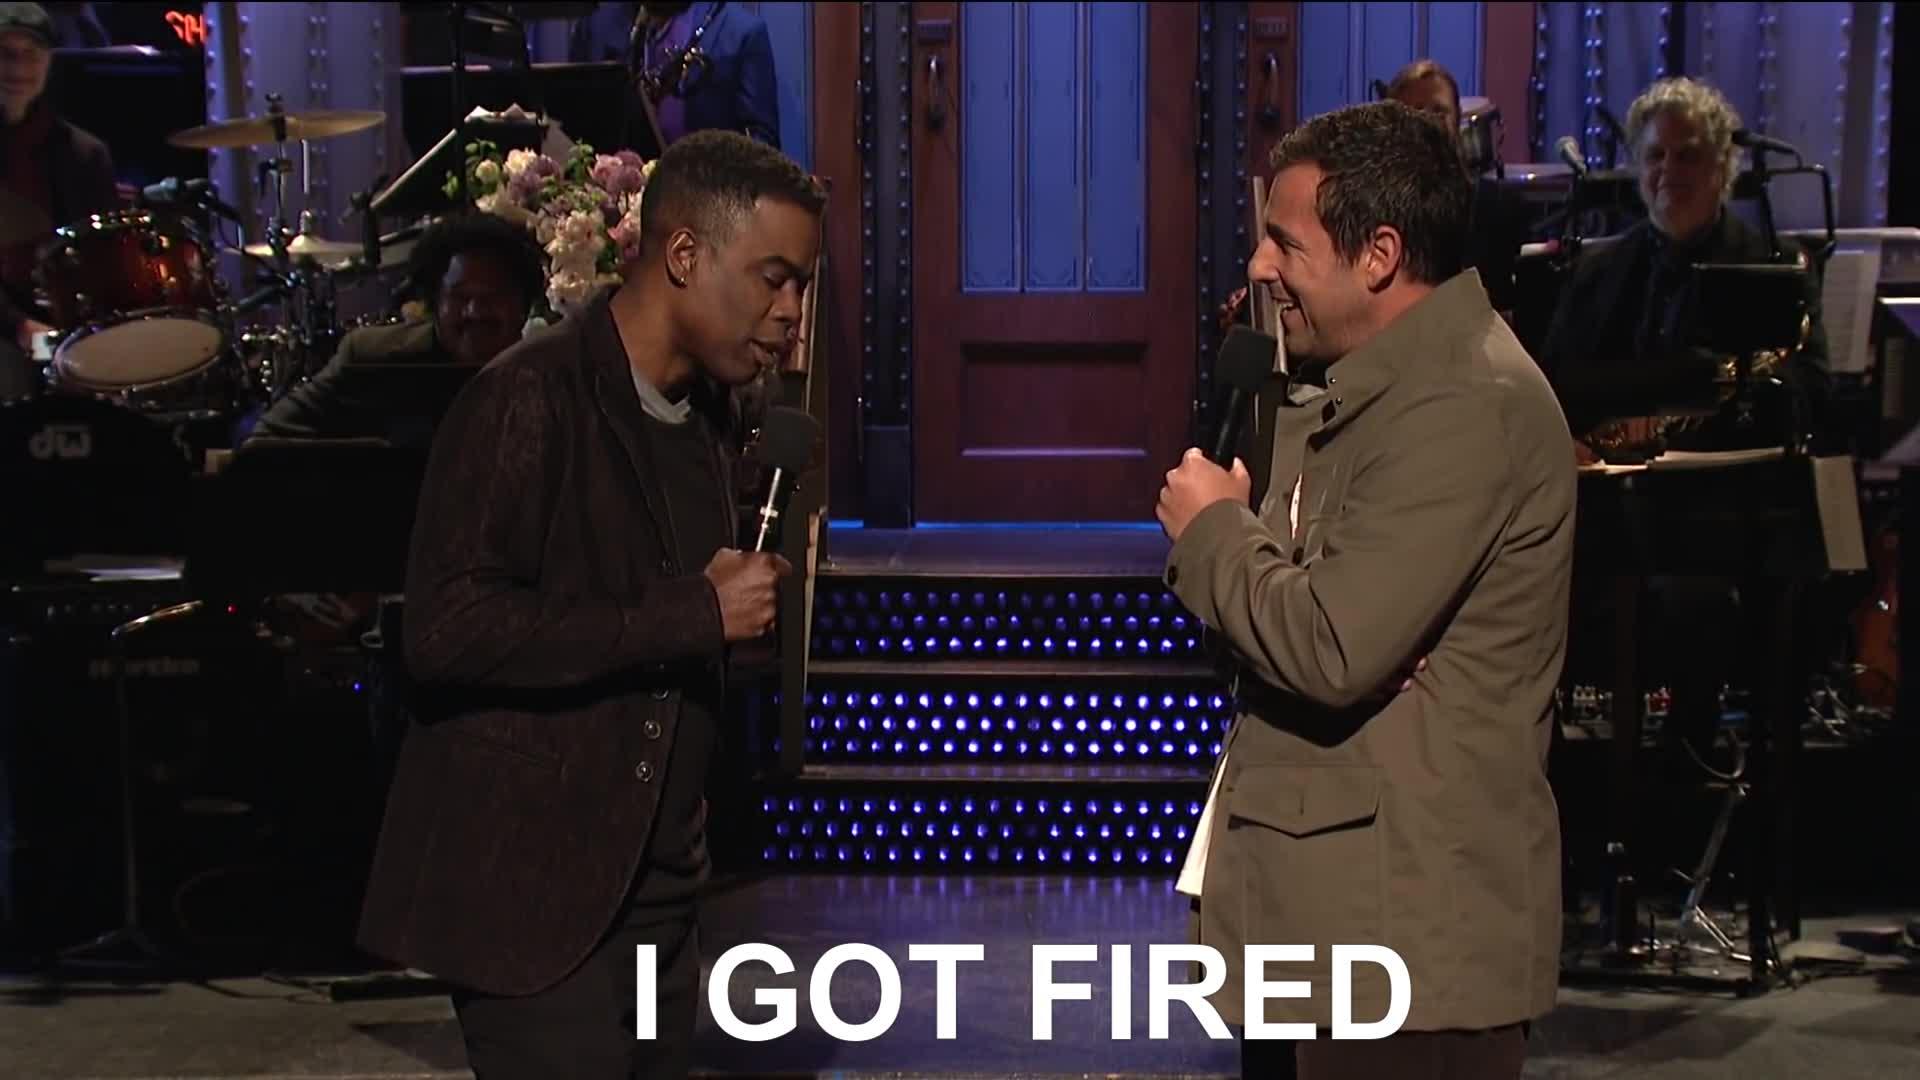 adam sandler, chris rock, comedy, fired, saturday night live, snl, Chris Rock Adam Sandler I Was Fired SNL GIFs